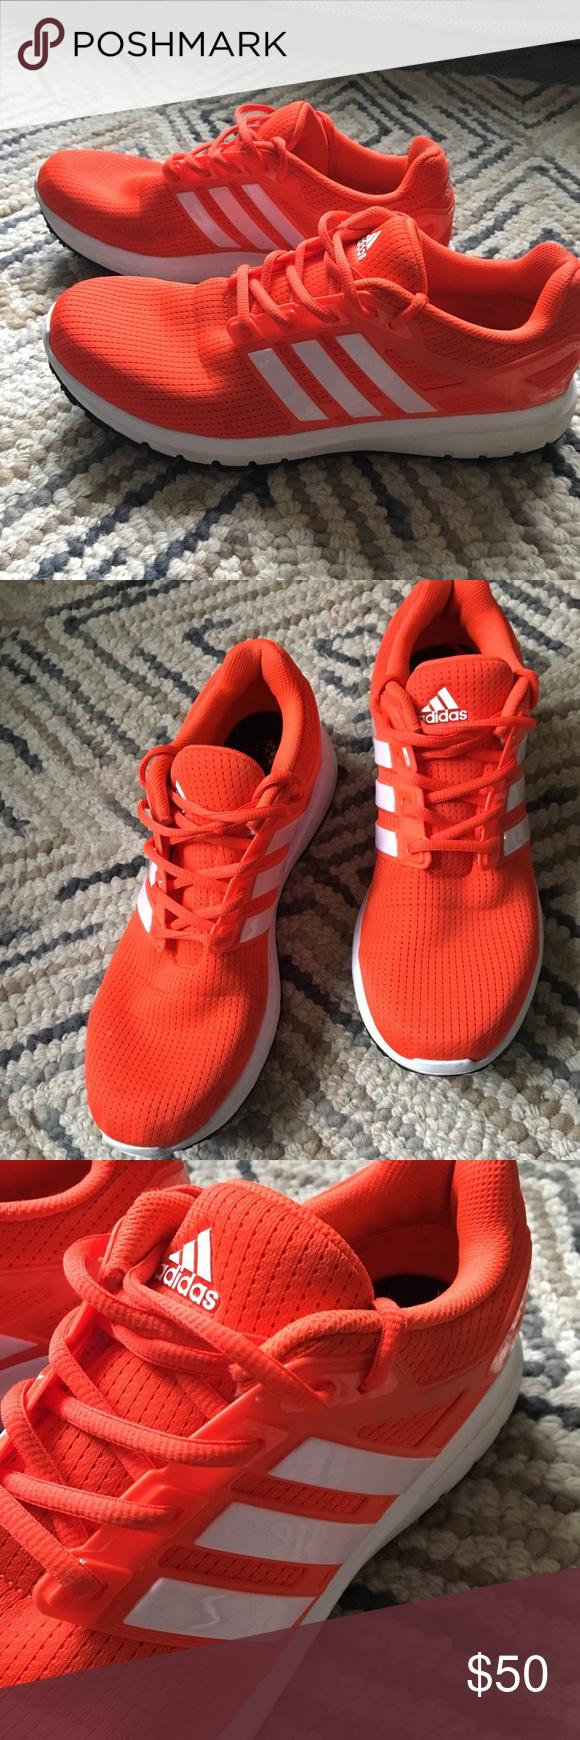 bright orange adidas shoes online -